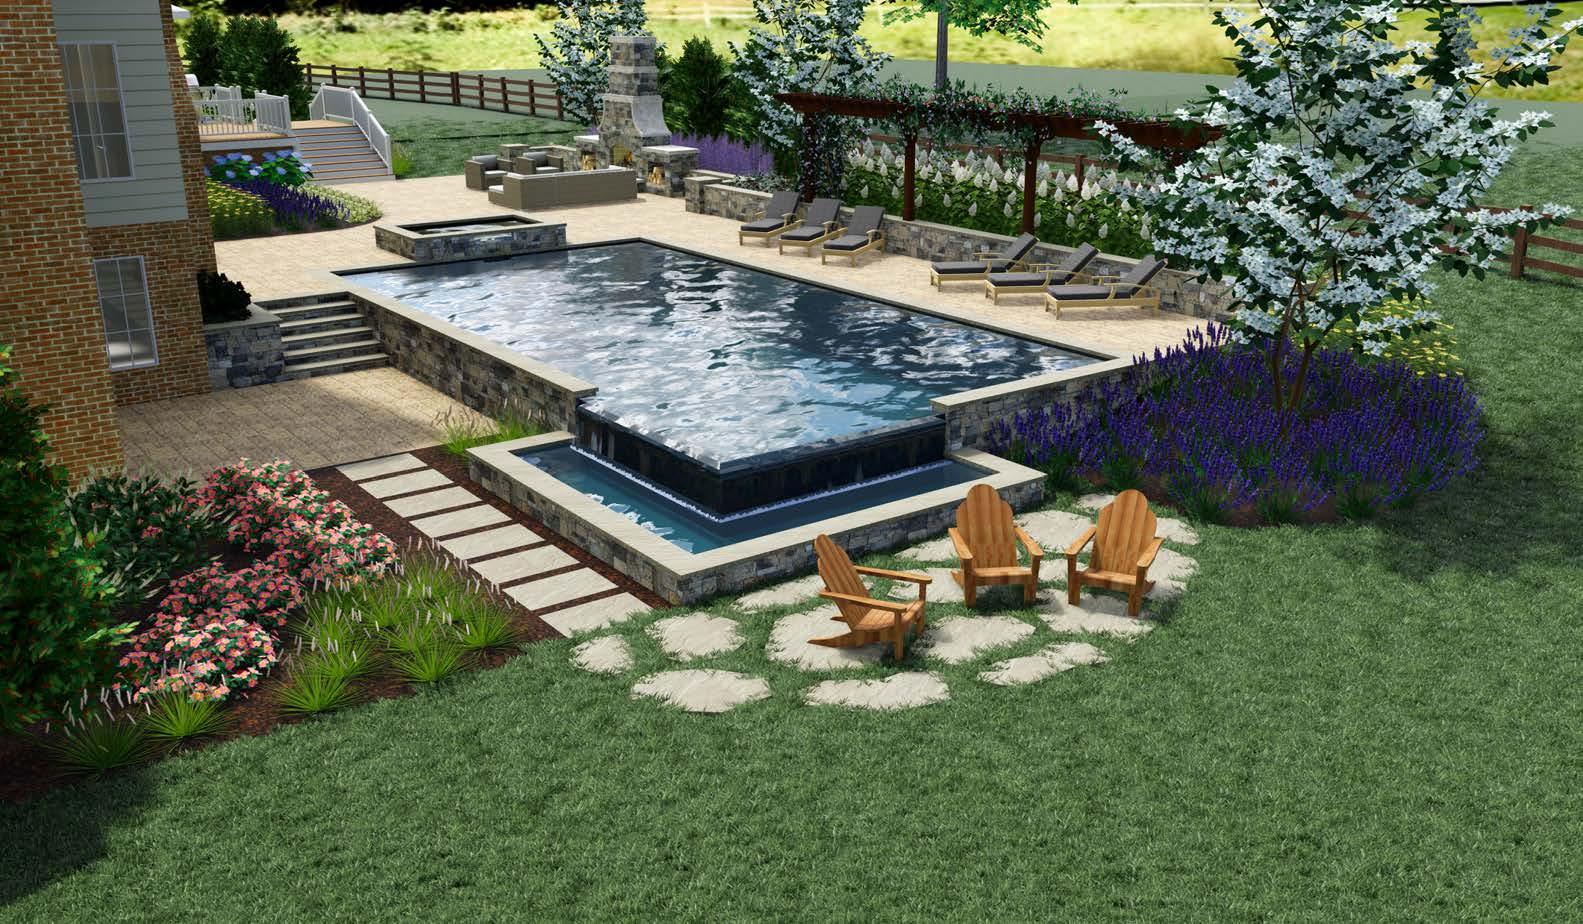 landscape-design-3D-rendering-ashburn-aldie-leesburg-va-20